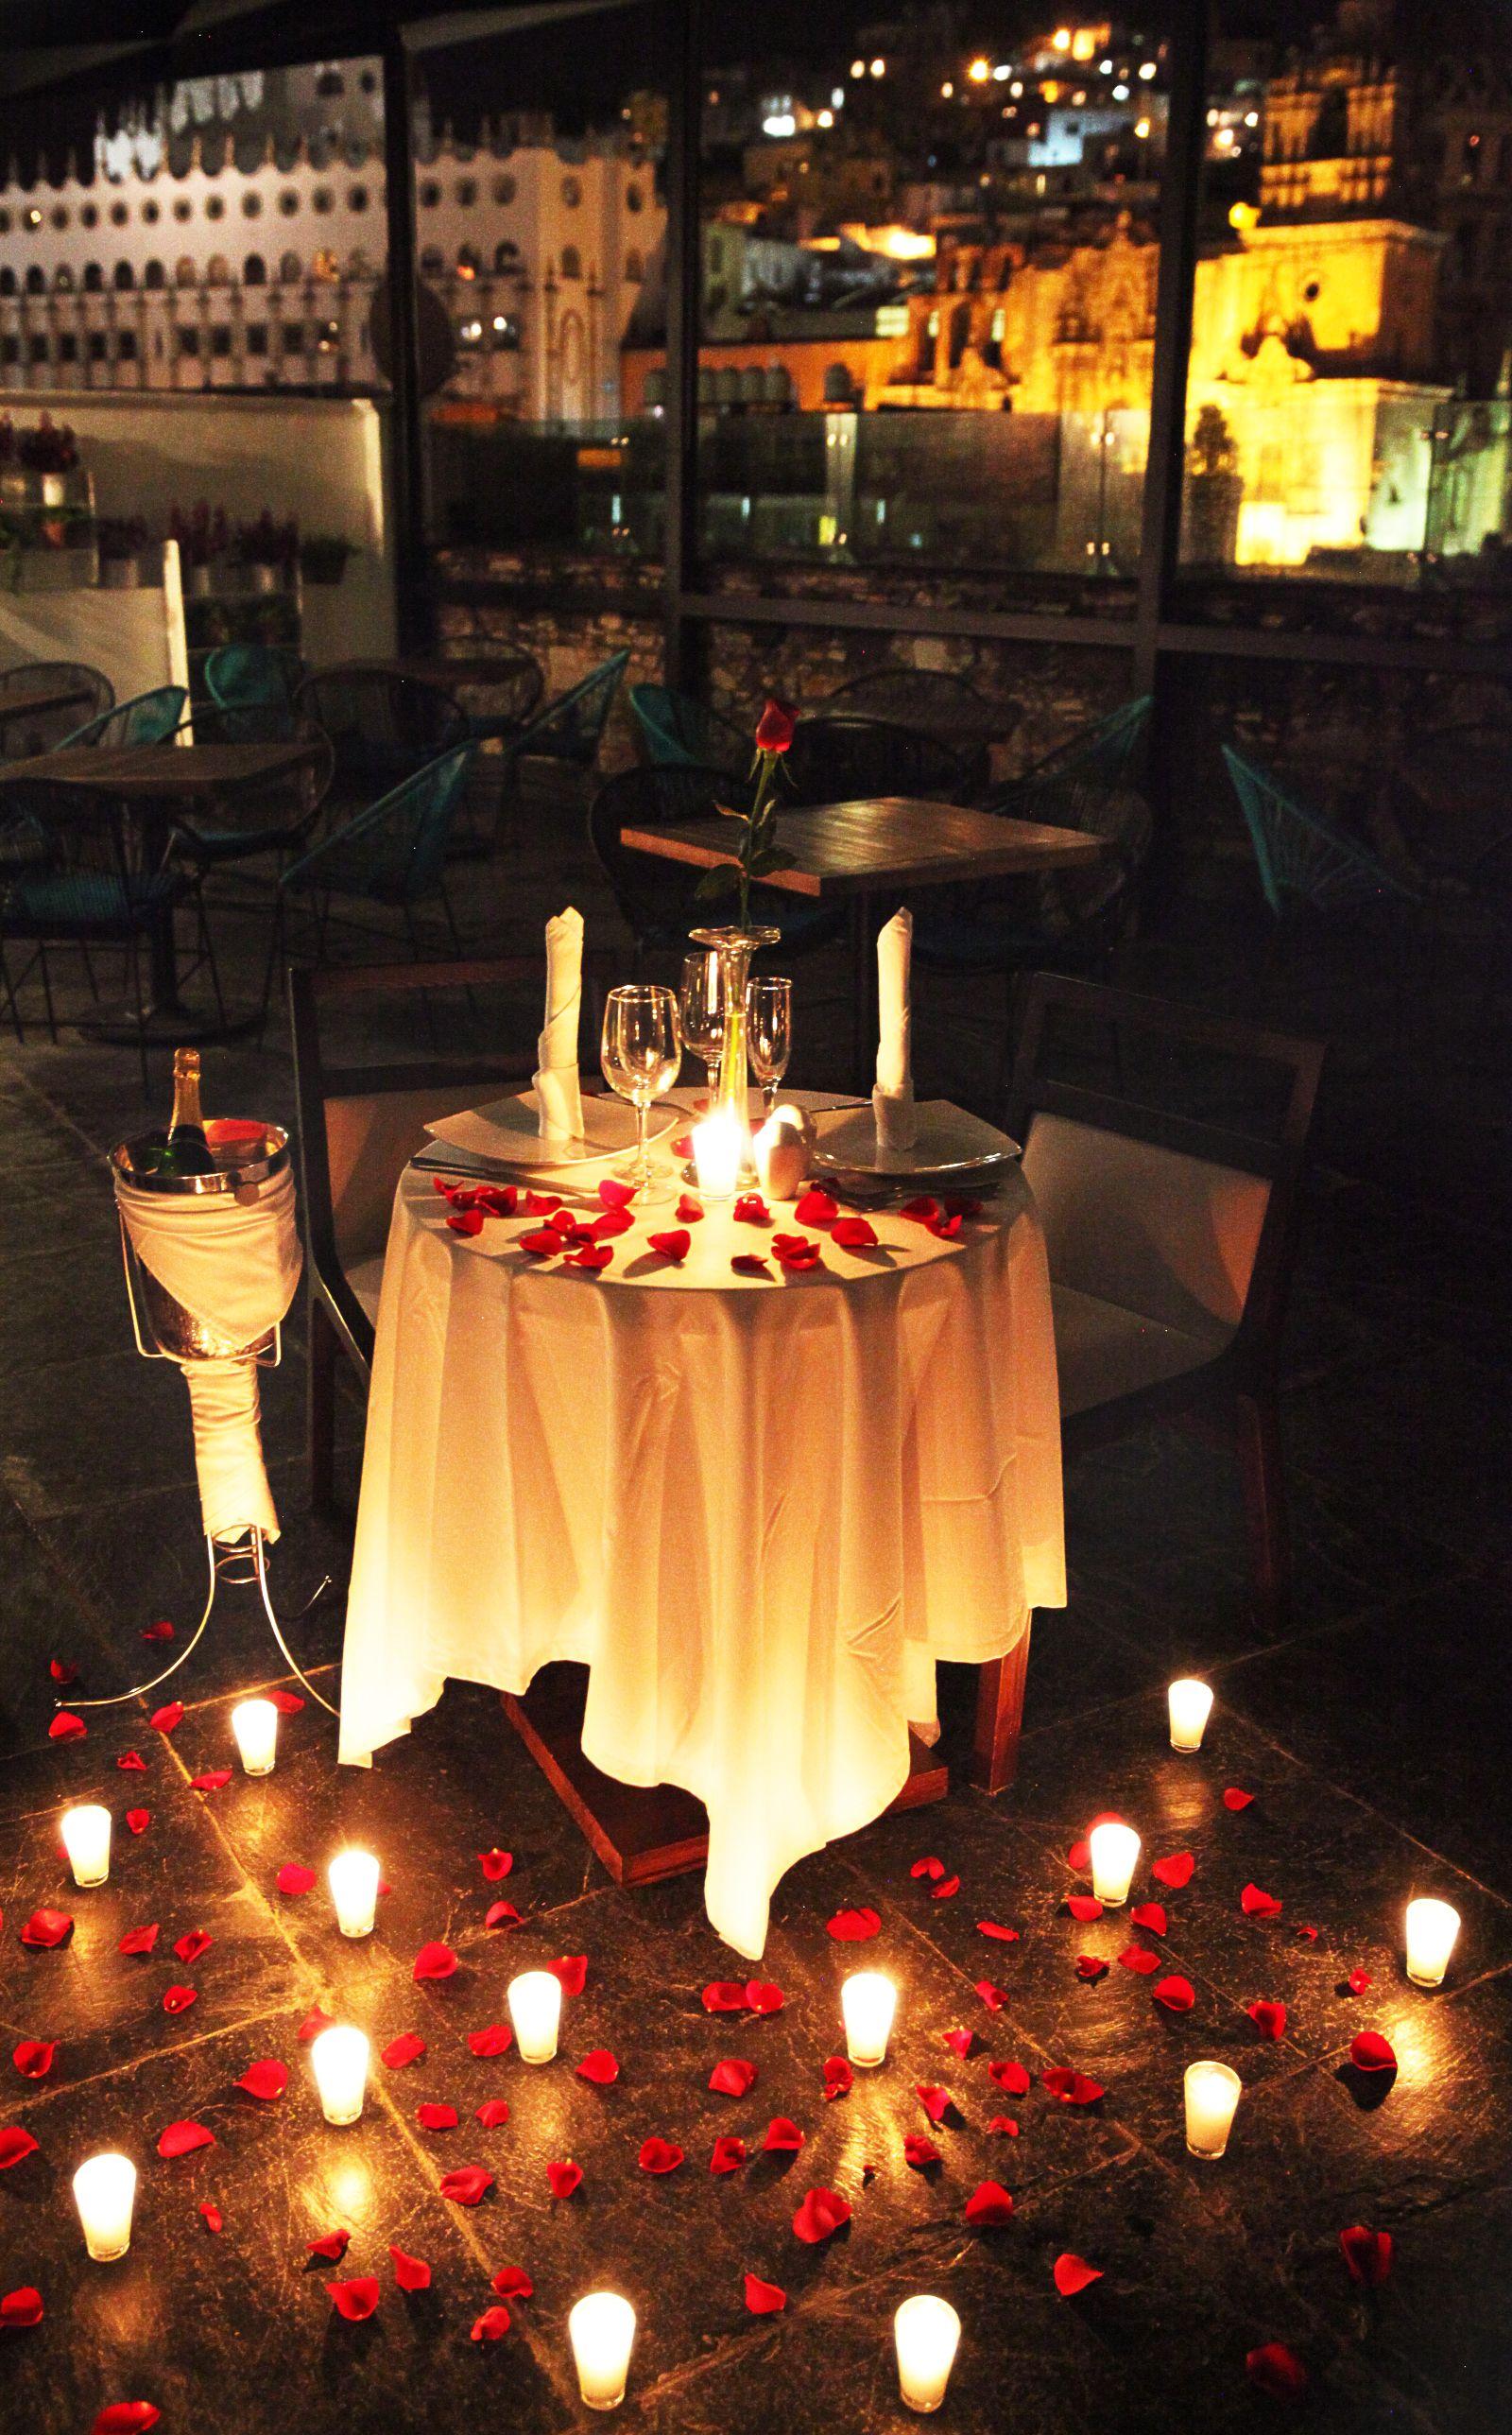 Hd Wallpapers Backgrounds Romantic Ideas Pinterest Romantic - Cena-romantica-decoracion